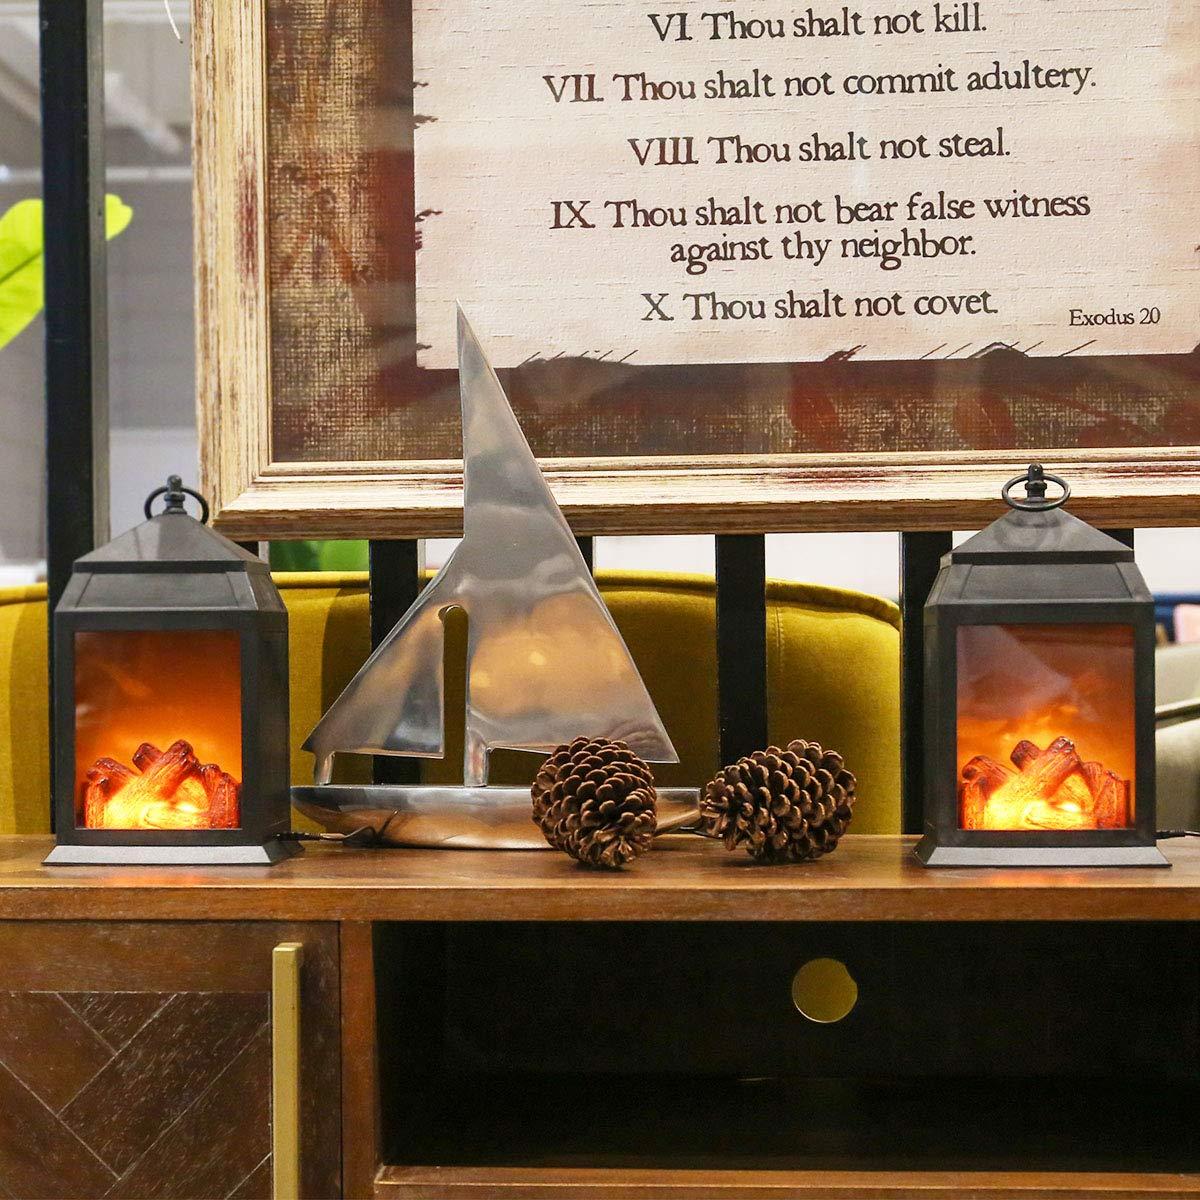 Decorative Lanterns,12'' Fireplace Lantern Flameless LED Lantern Battery Powered and USB 6 Hours Timer Indoor/Outdoor Hanging Lantern,Black Fireplace Lamp(Pack of 2)